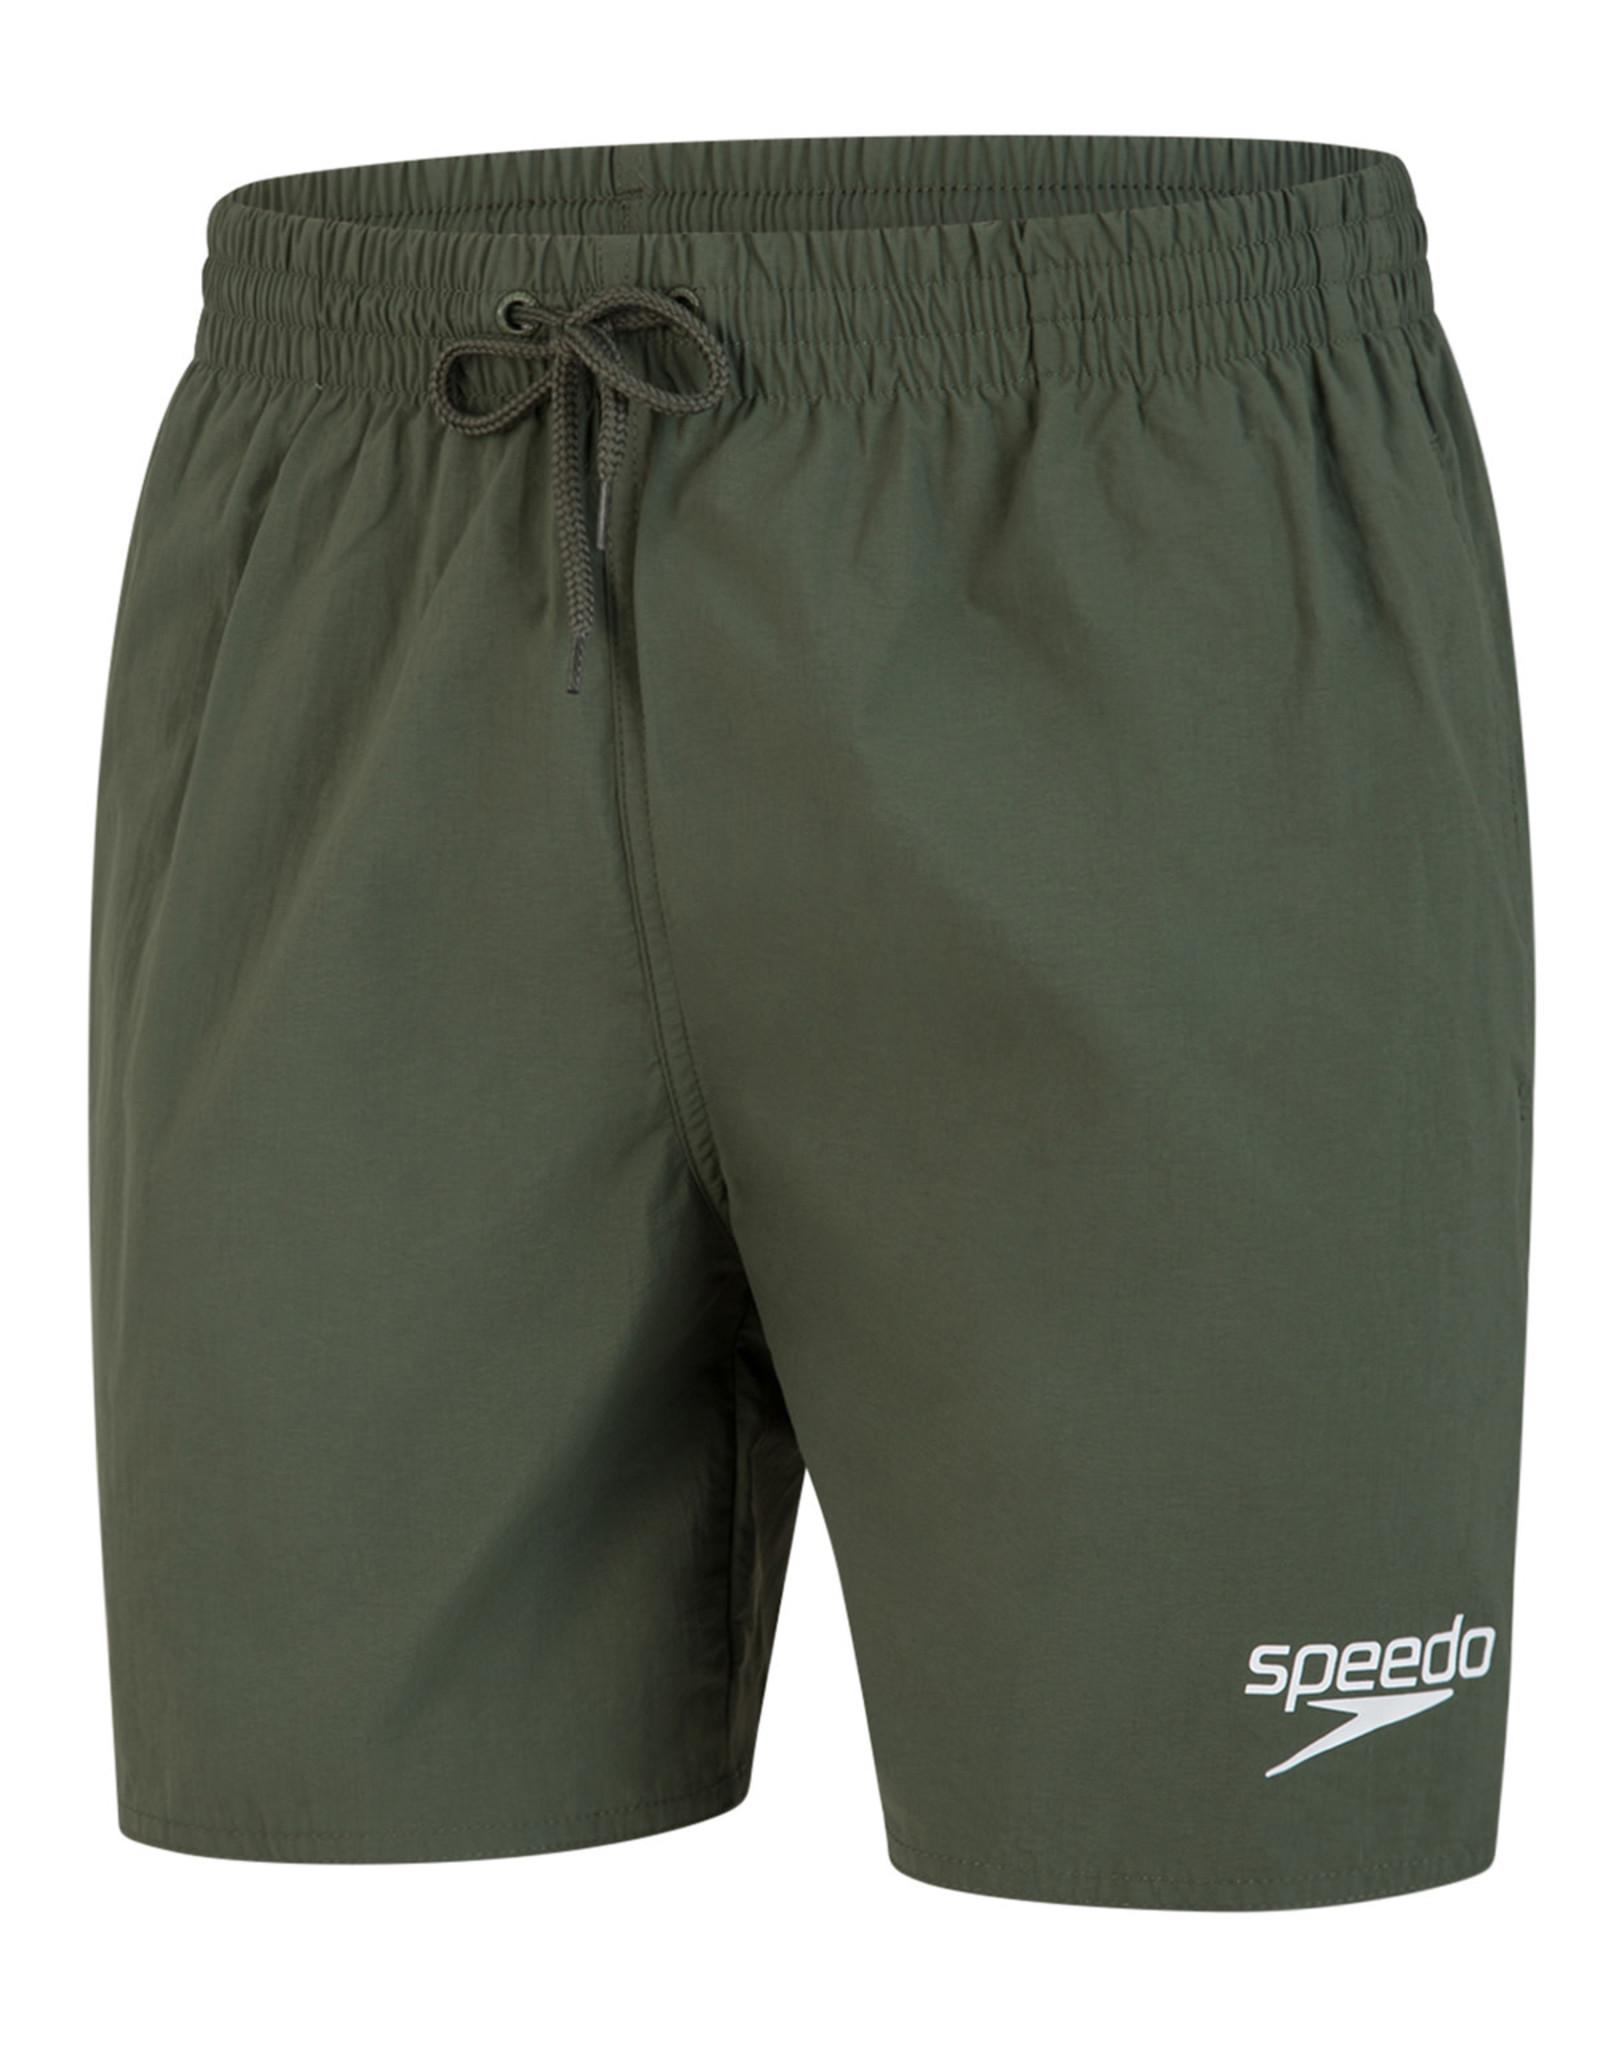 Speedo Essentials 16